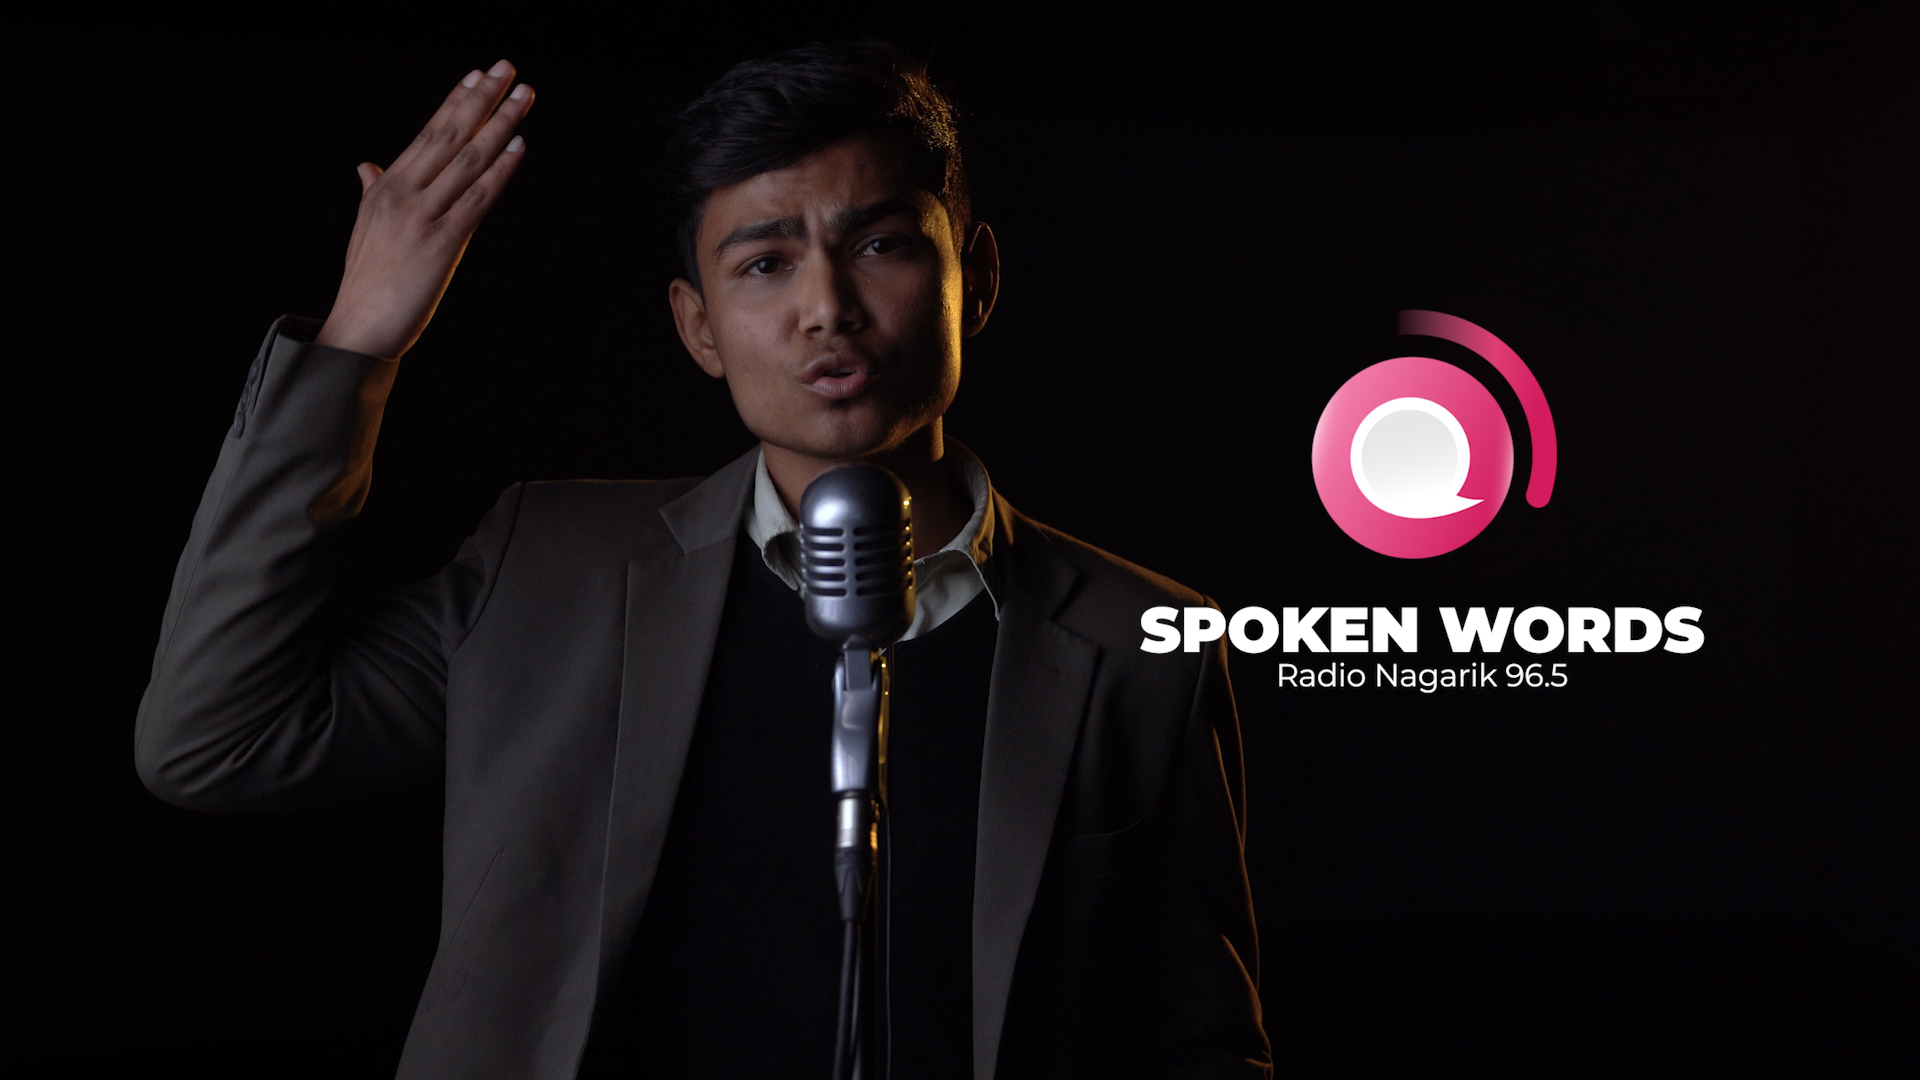 'Nari Nyaya Ra Nirmala' ( नारी न्याय र निर्मला ) | Spoken Words performed by Nitesh Thapa